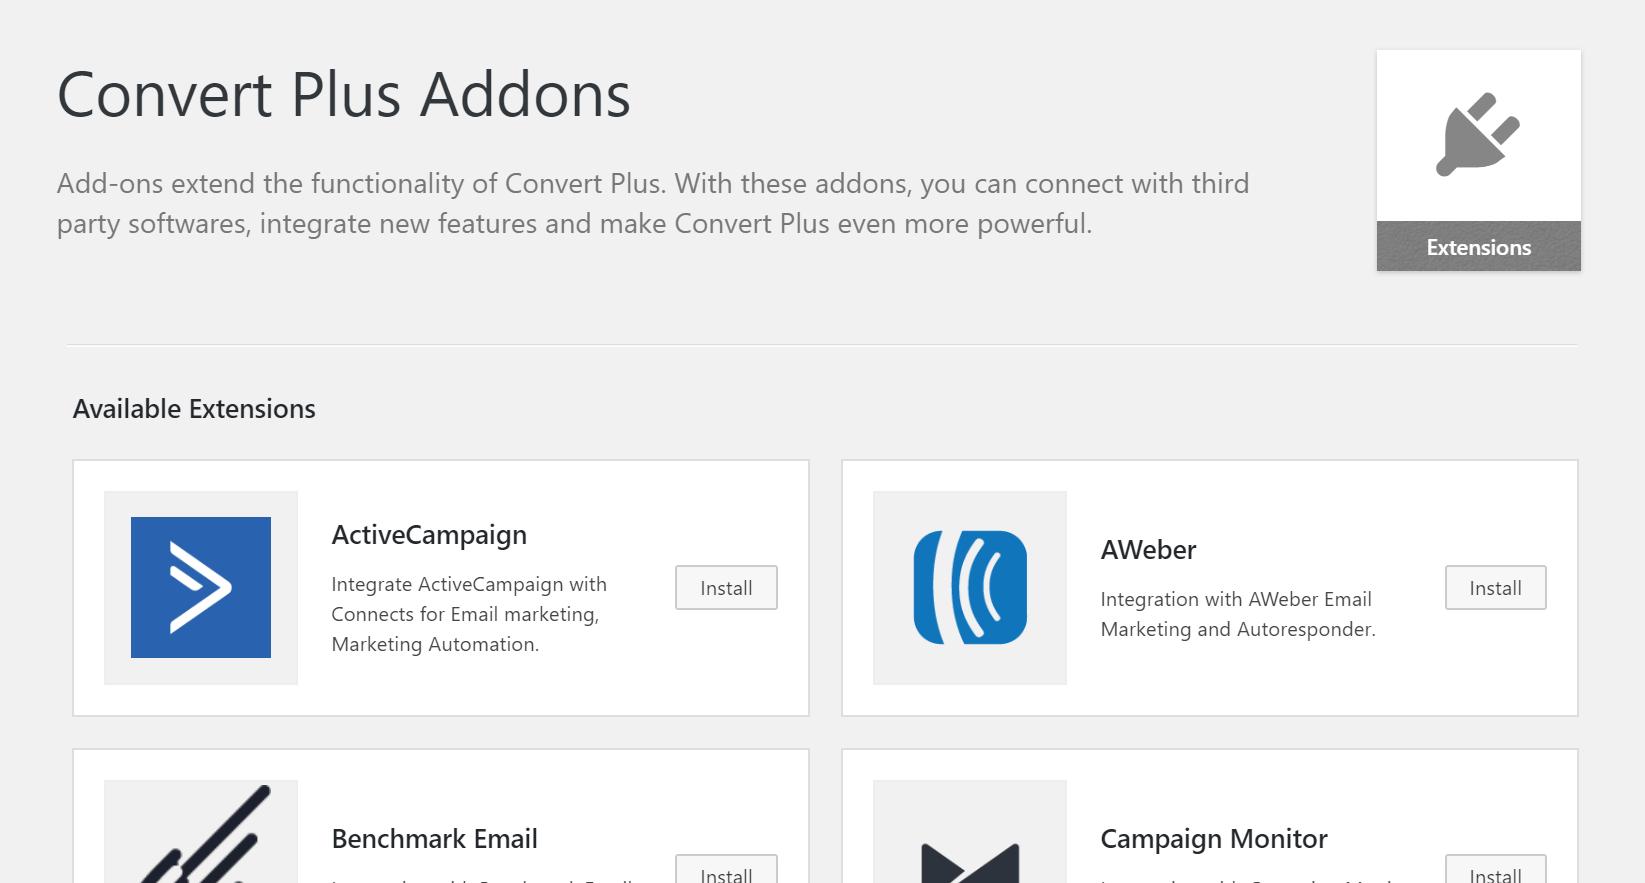 ConvertPlus Addons